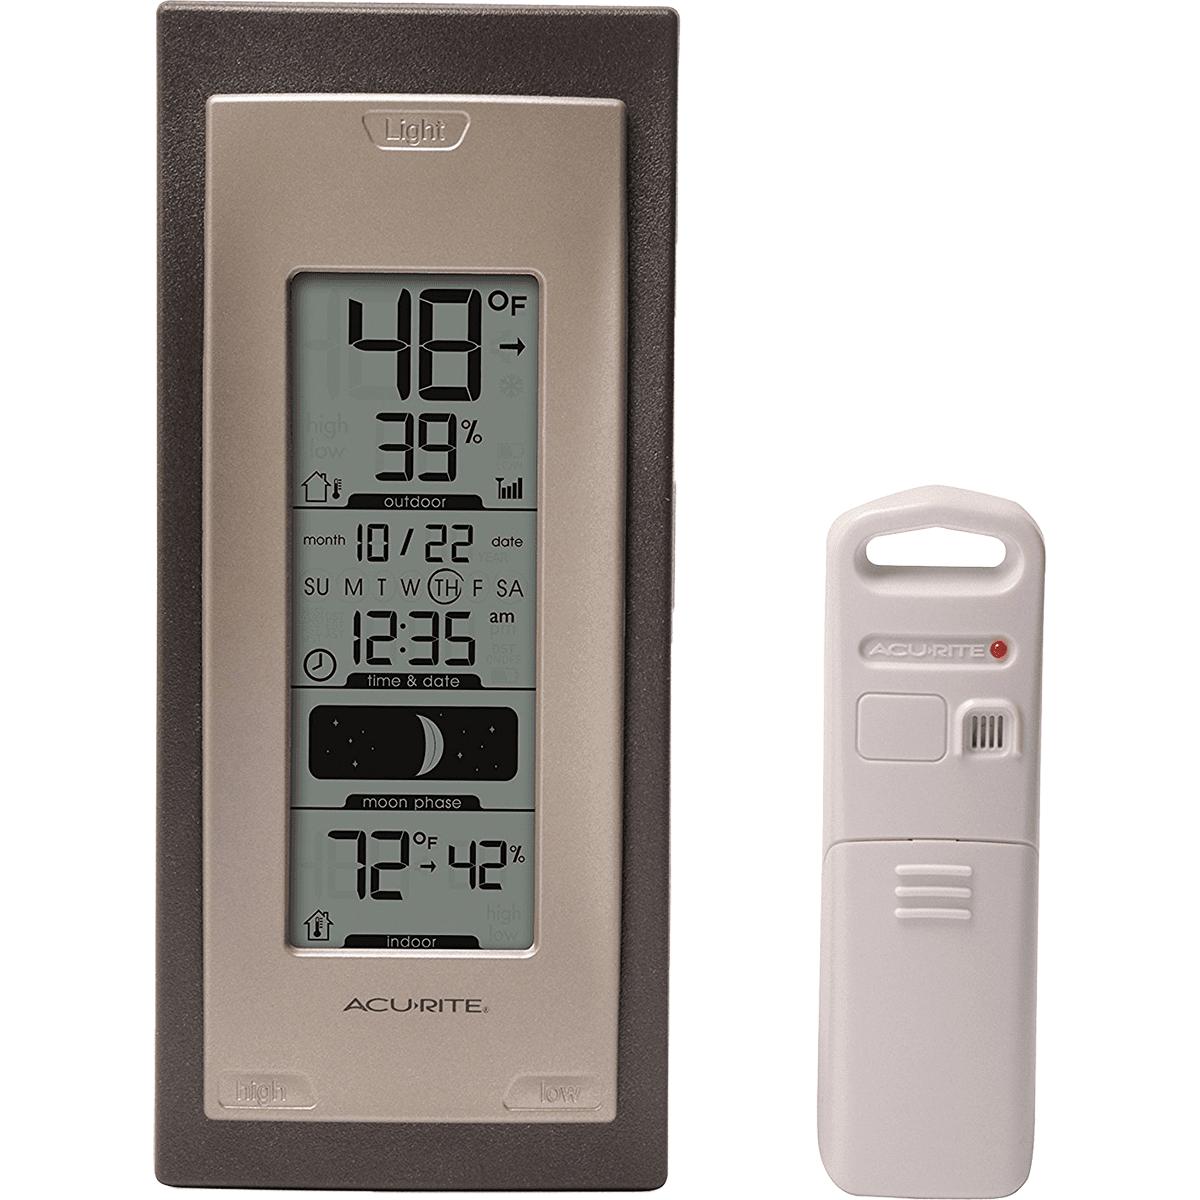 Acu-rite Remote Thermometer / Hygrometer - Digital